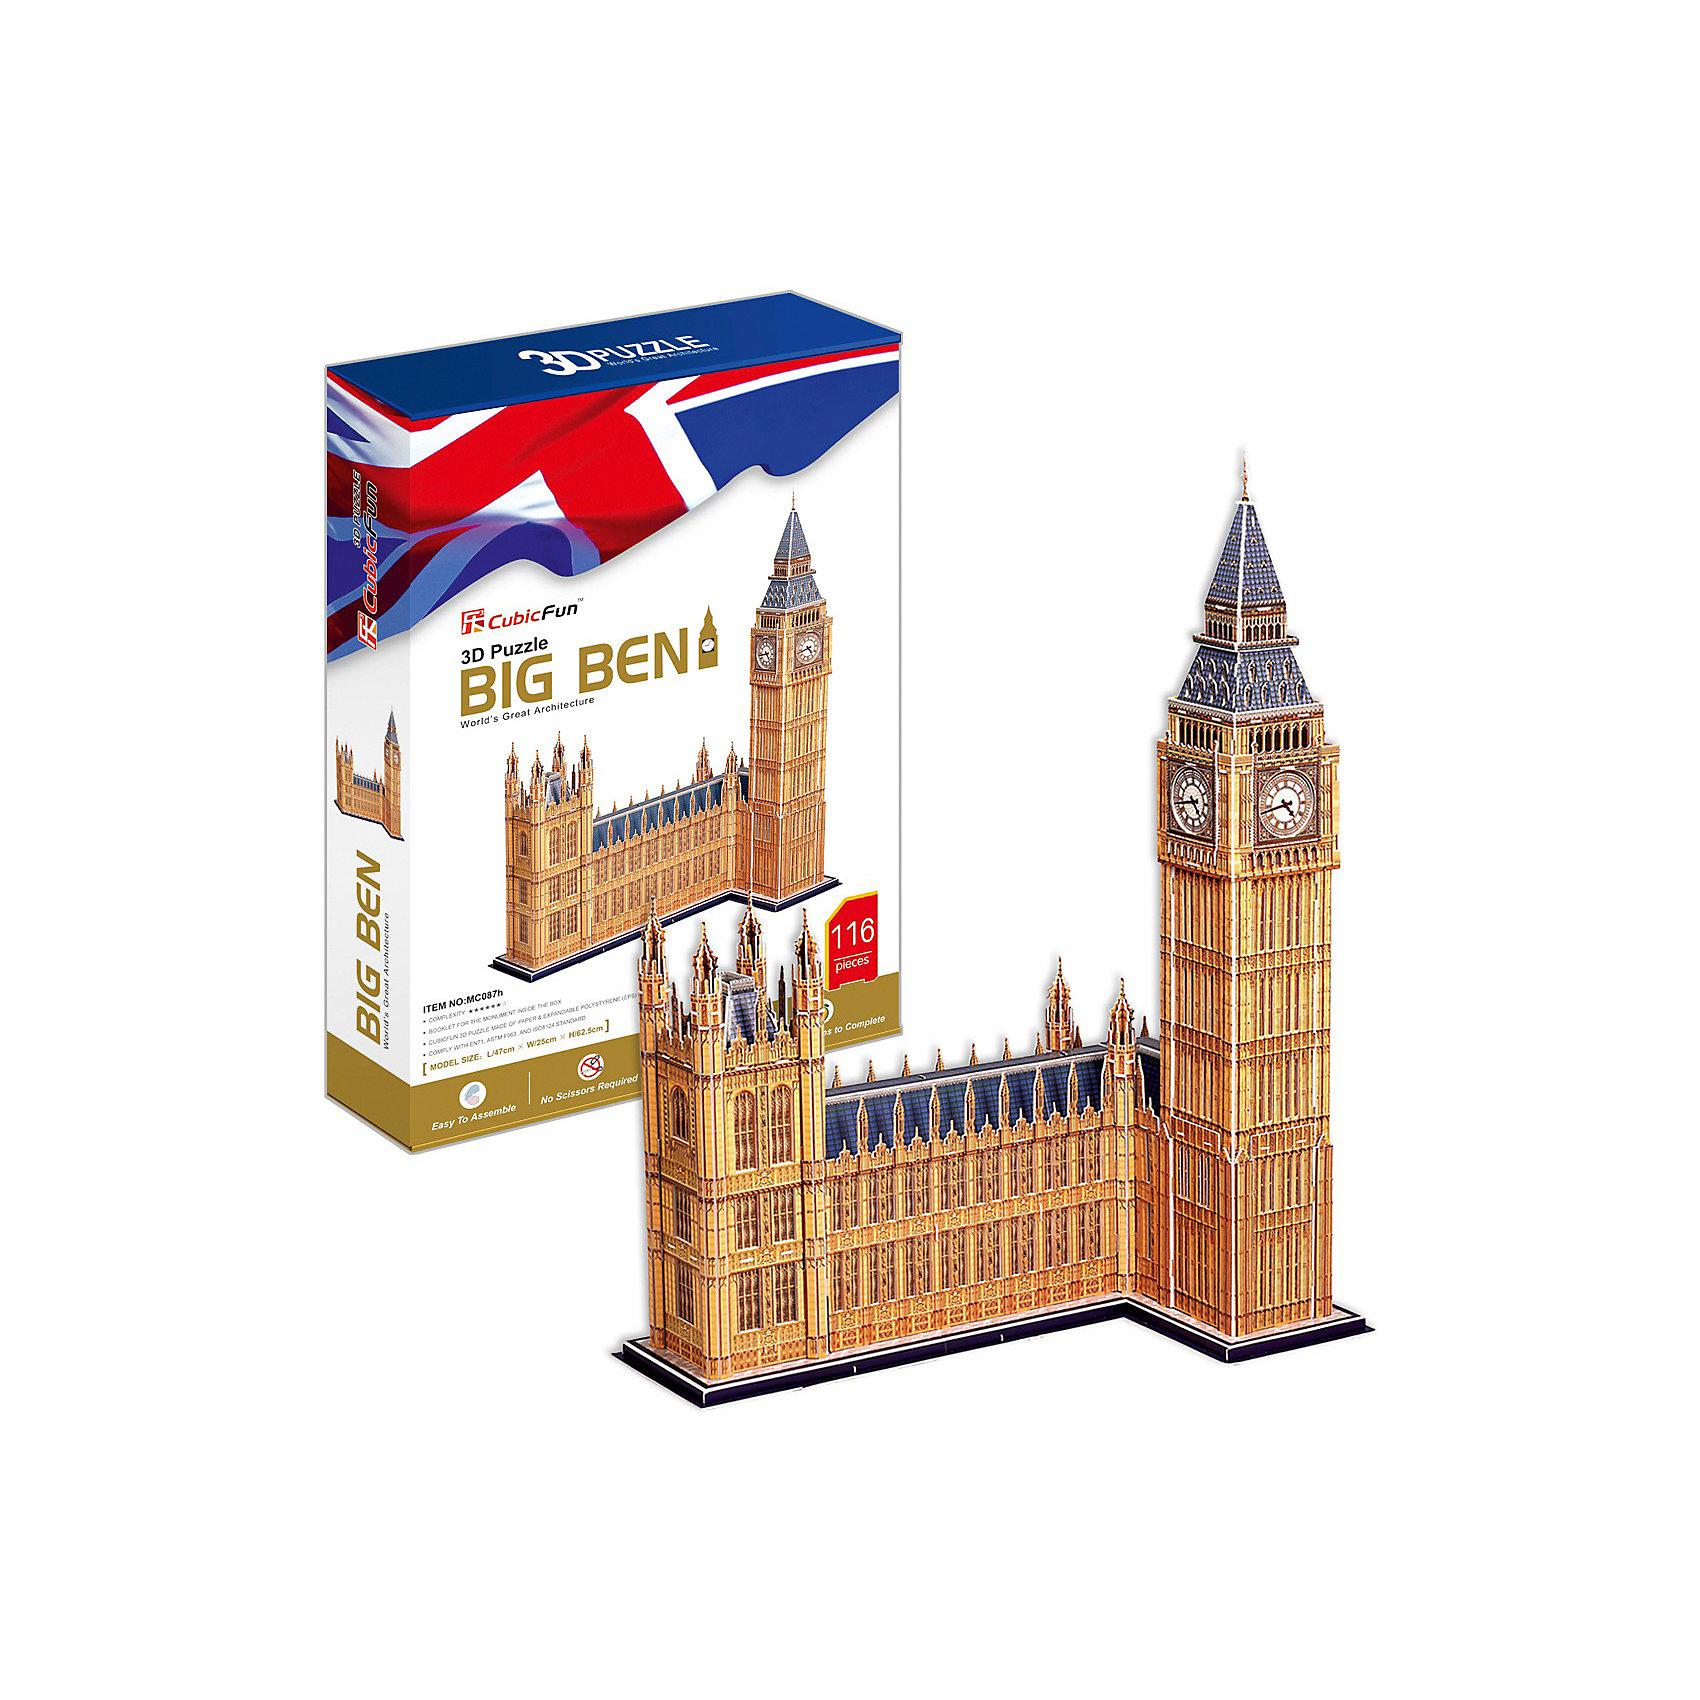 CubicFun Пазл 3D Биг Бен (Великобритания), 116 деталей, CubicFun cubicfun 3d пазл эйфелева башня 2 франция cubicfun 33 детали